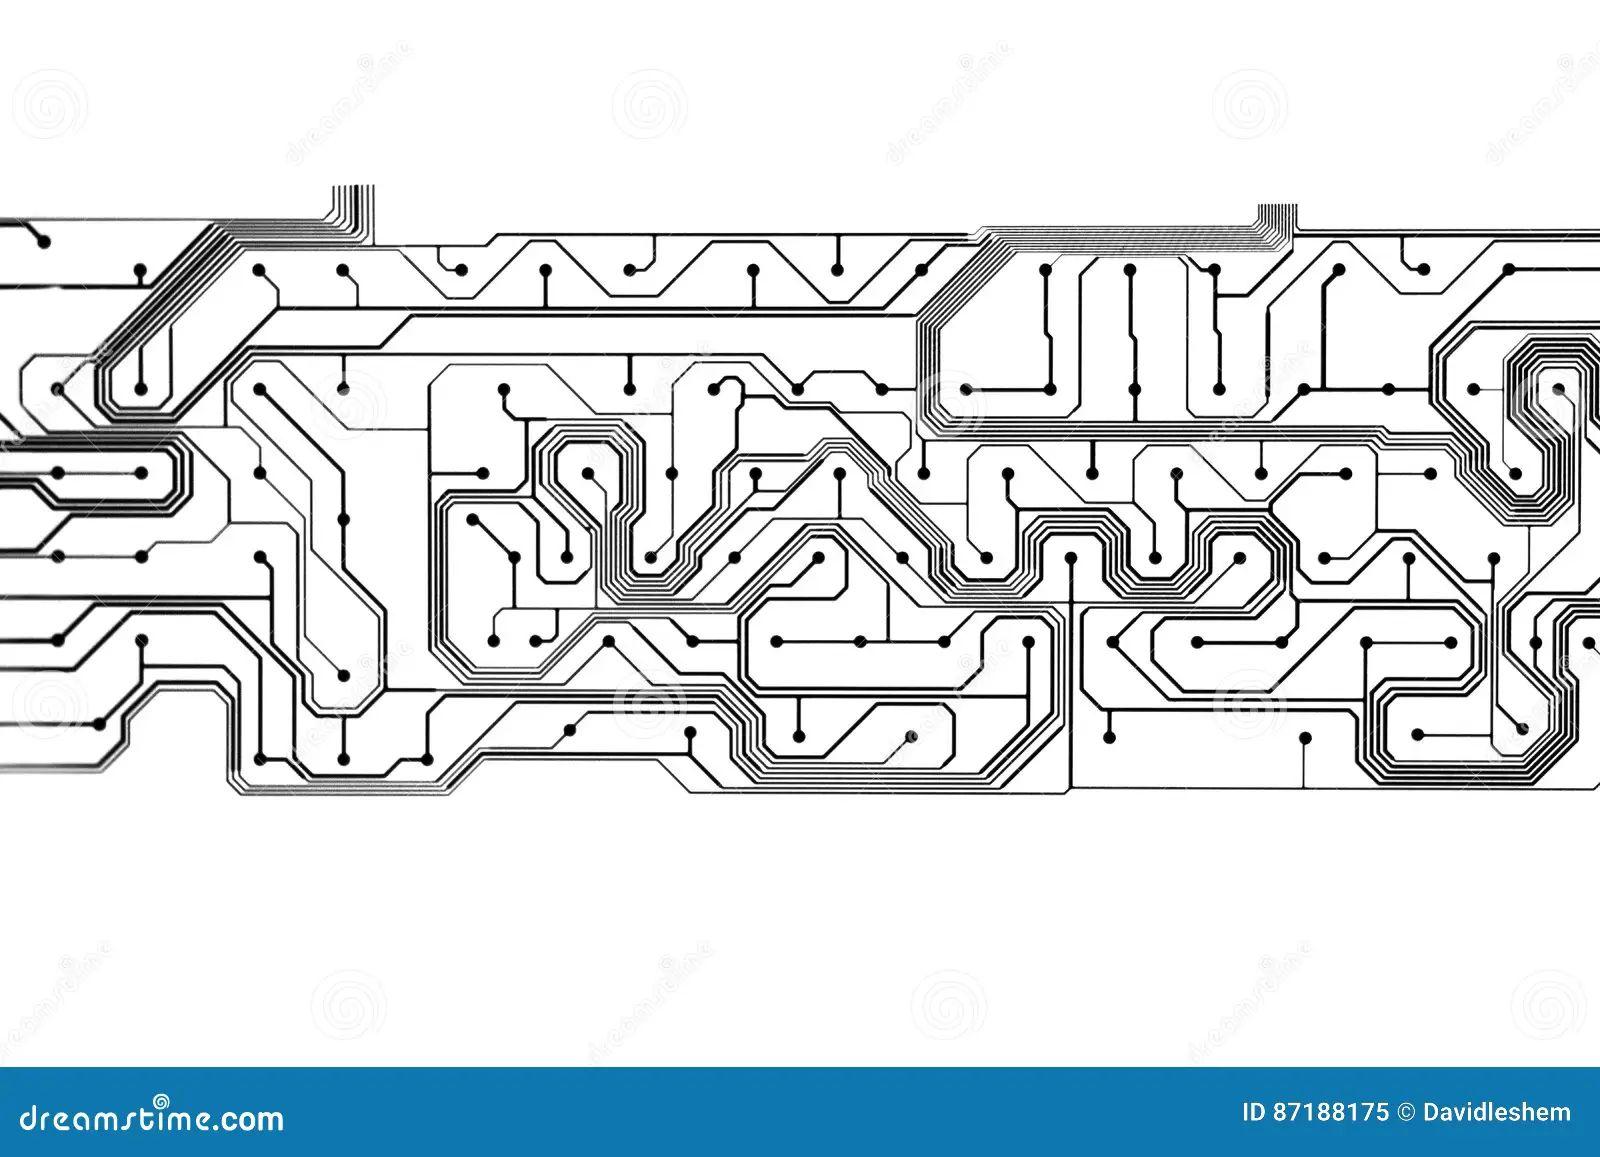 buy printed circuit board